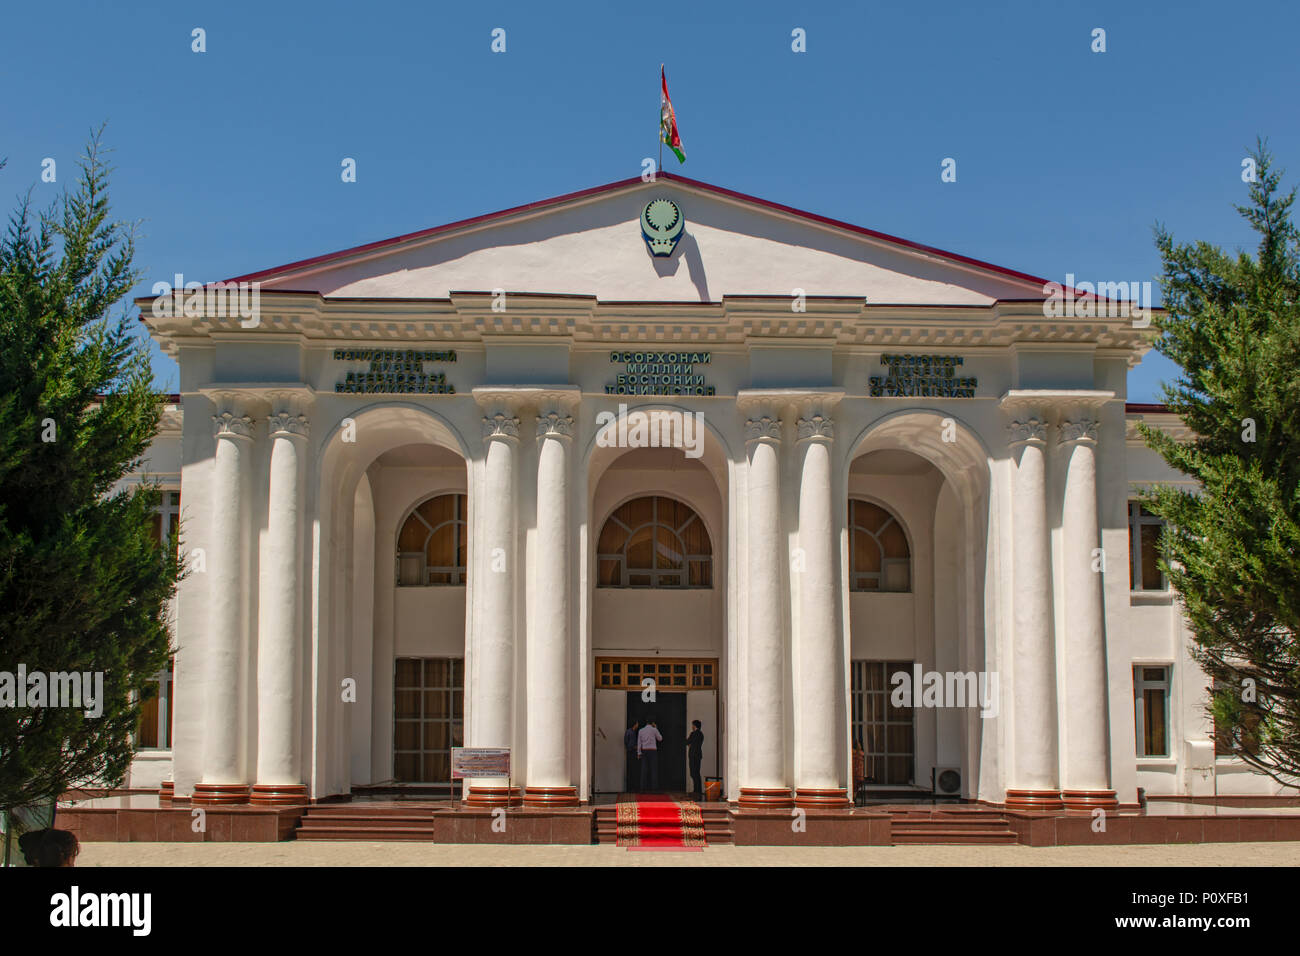 National Museum of Antiquities, Dushanbe, Tajikistan - Stock Image